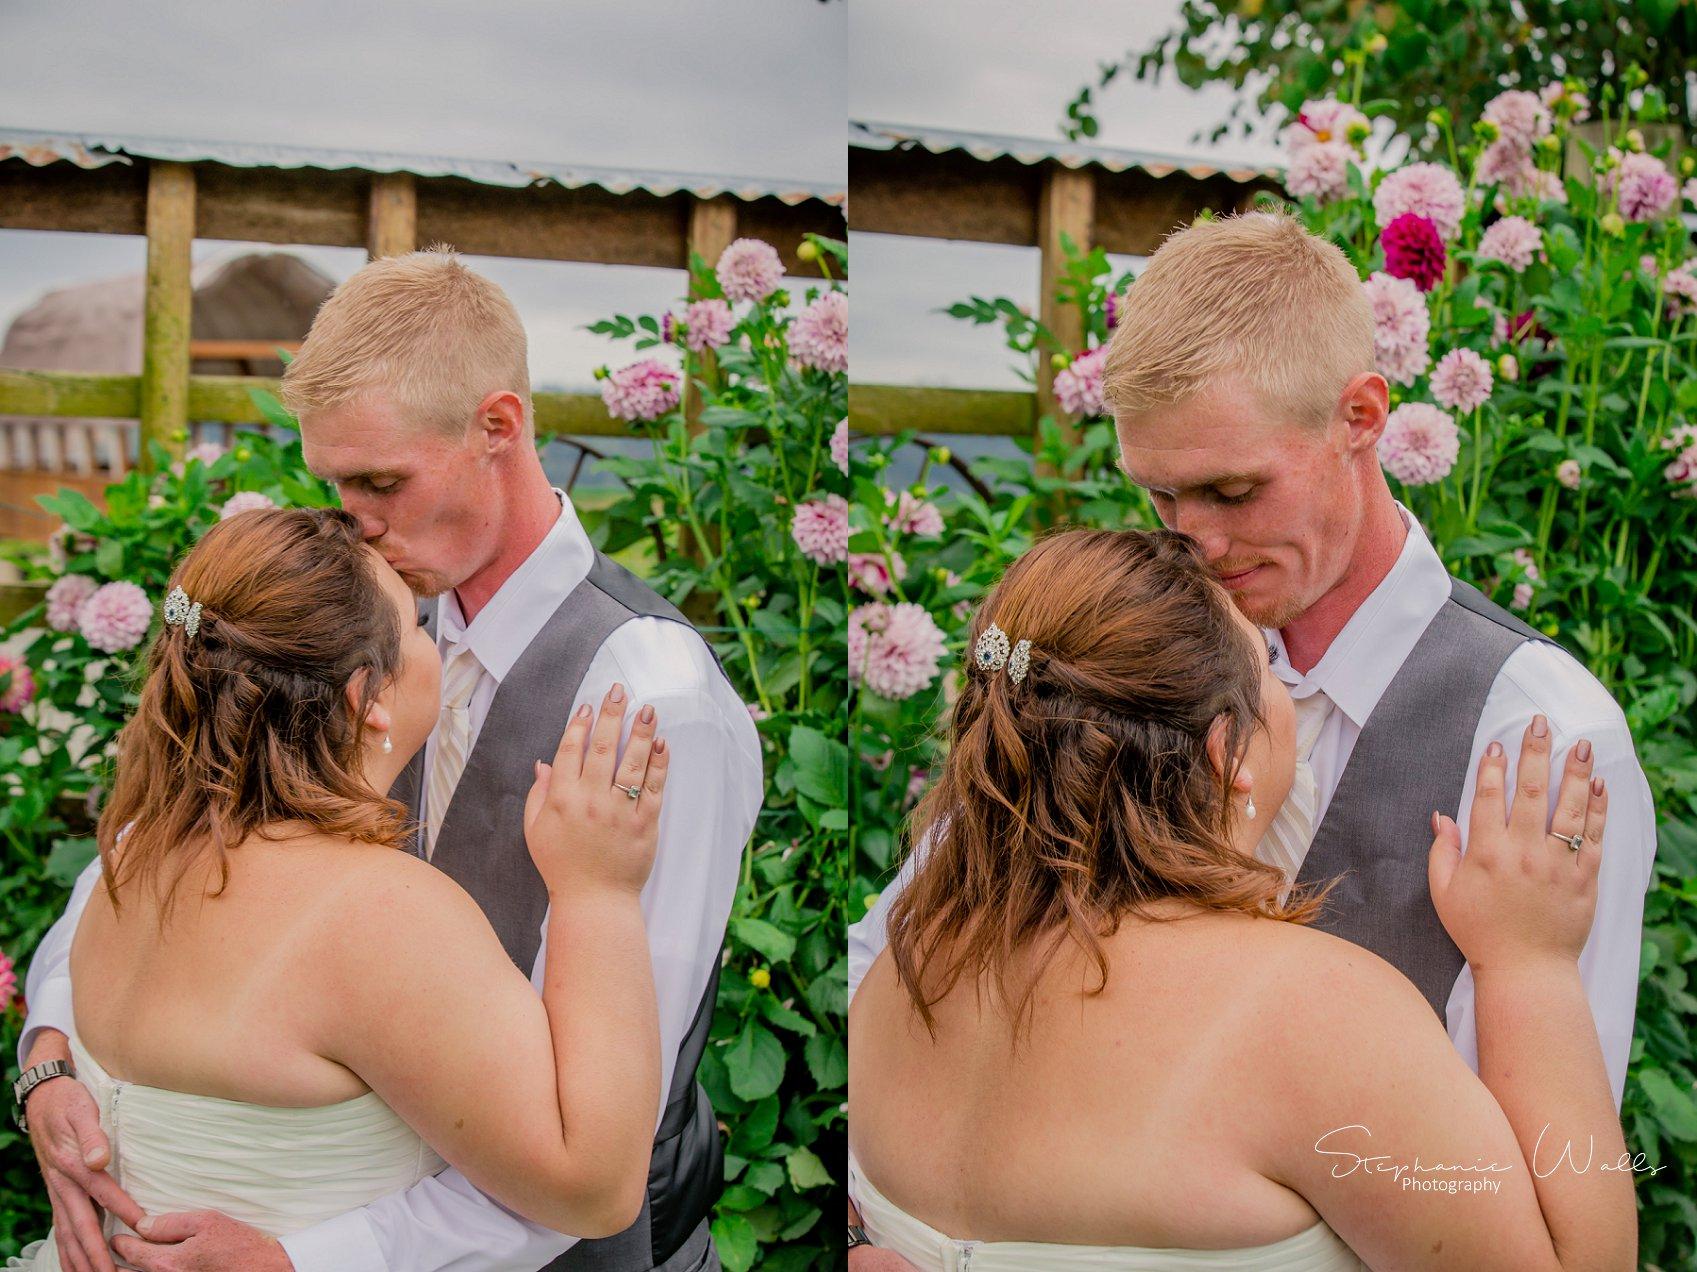 Kimble Wedding 132 Marlena & Allans | Snohomish Red Barn Events (Stocker Farms) | Snohomish, Wa Wedding Photographer